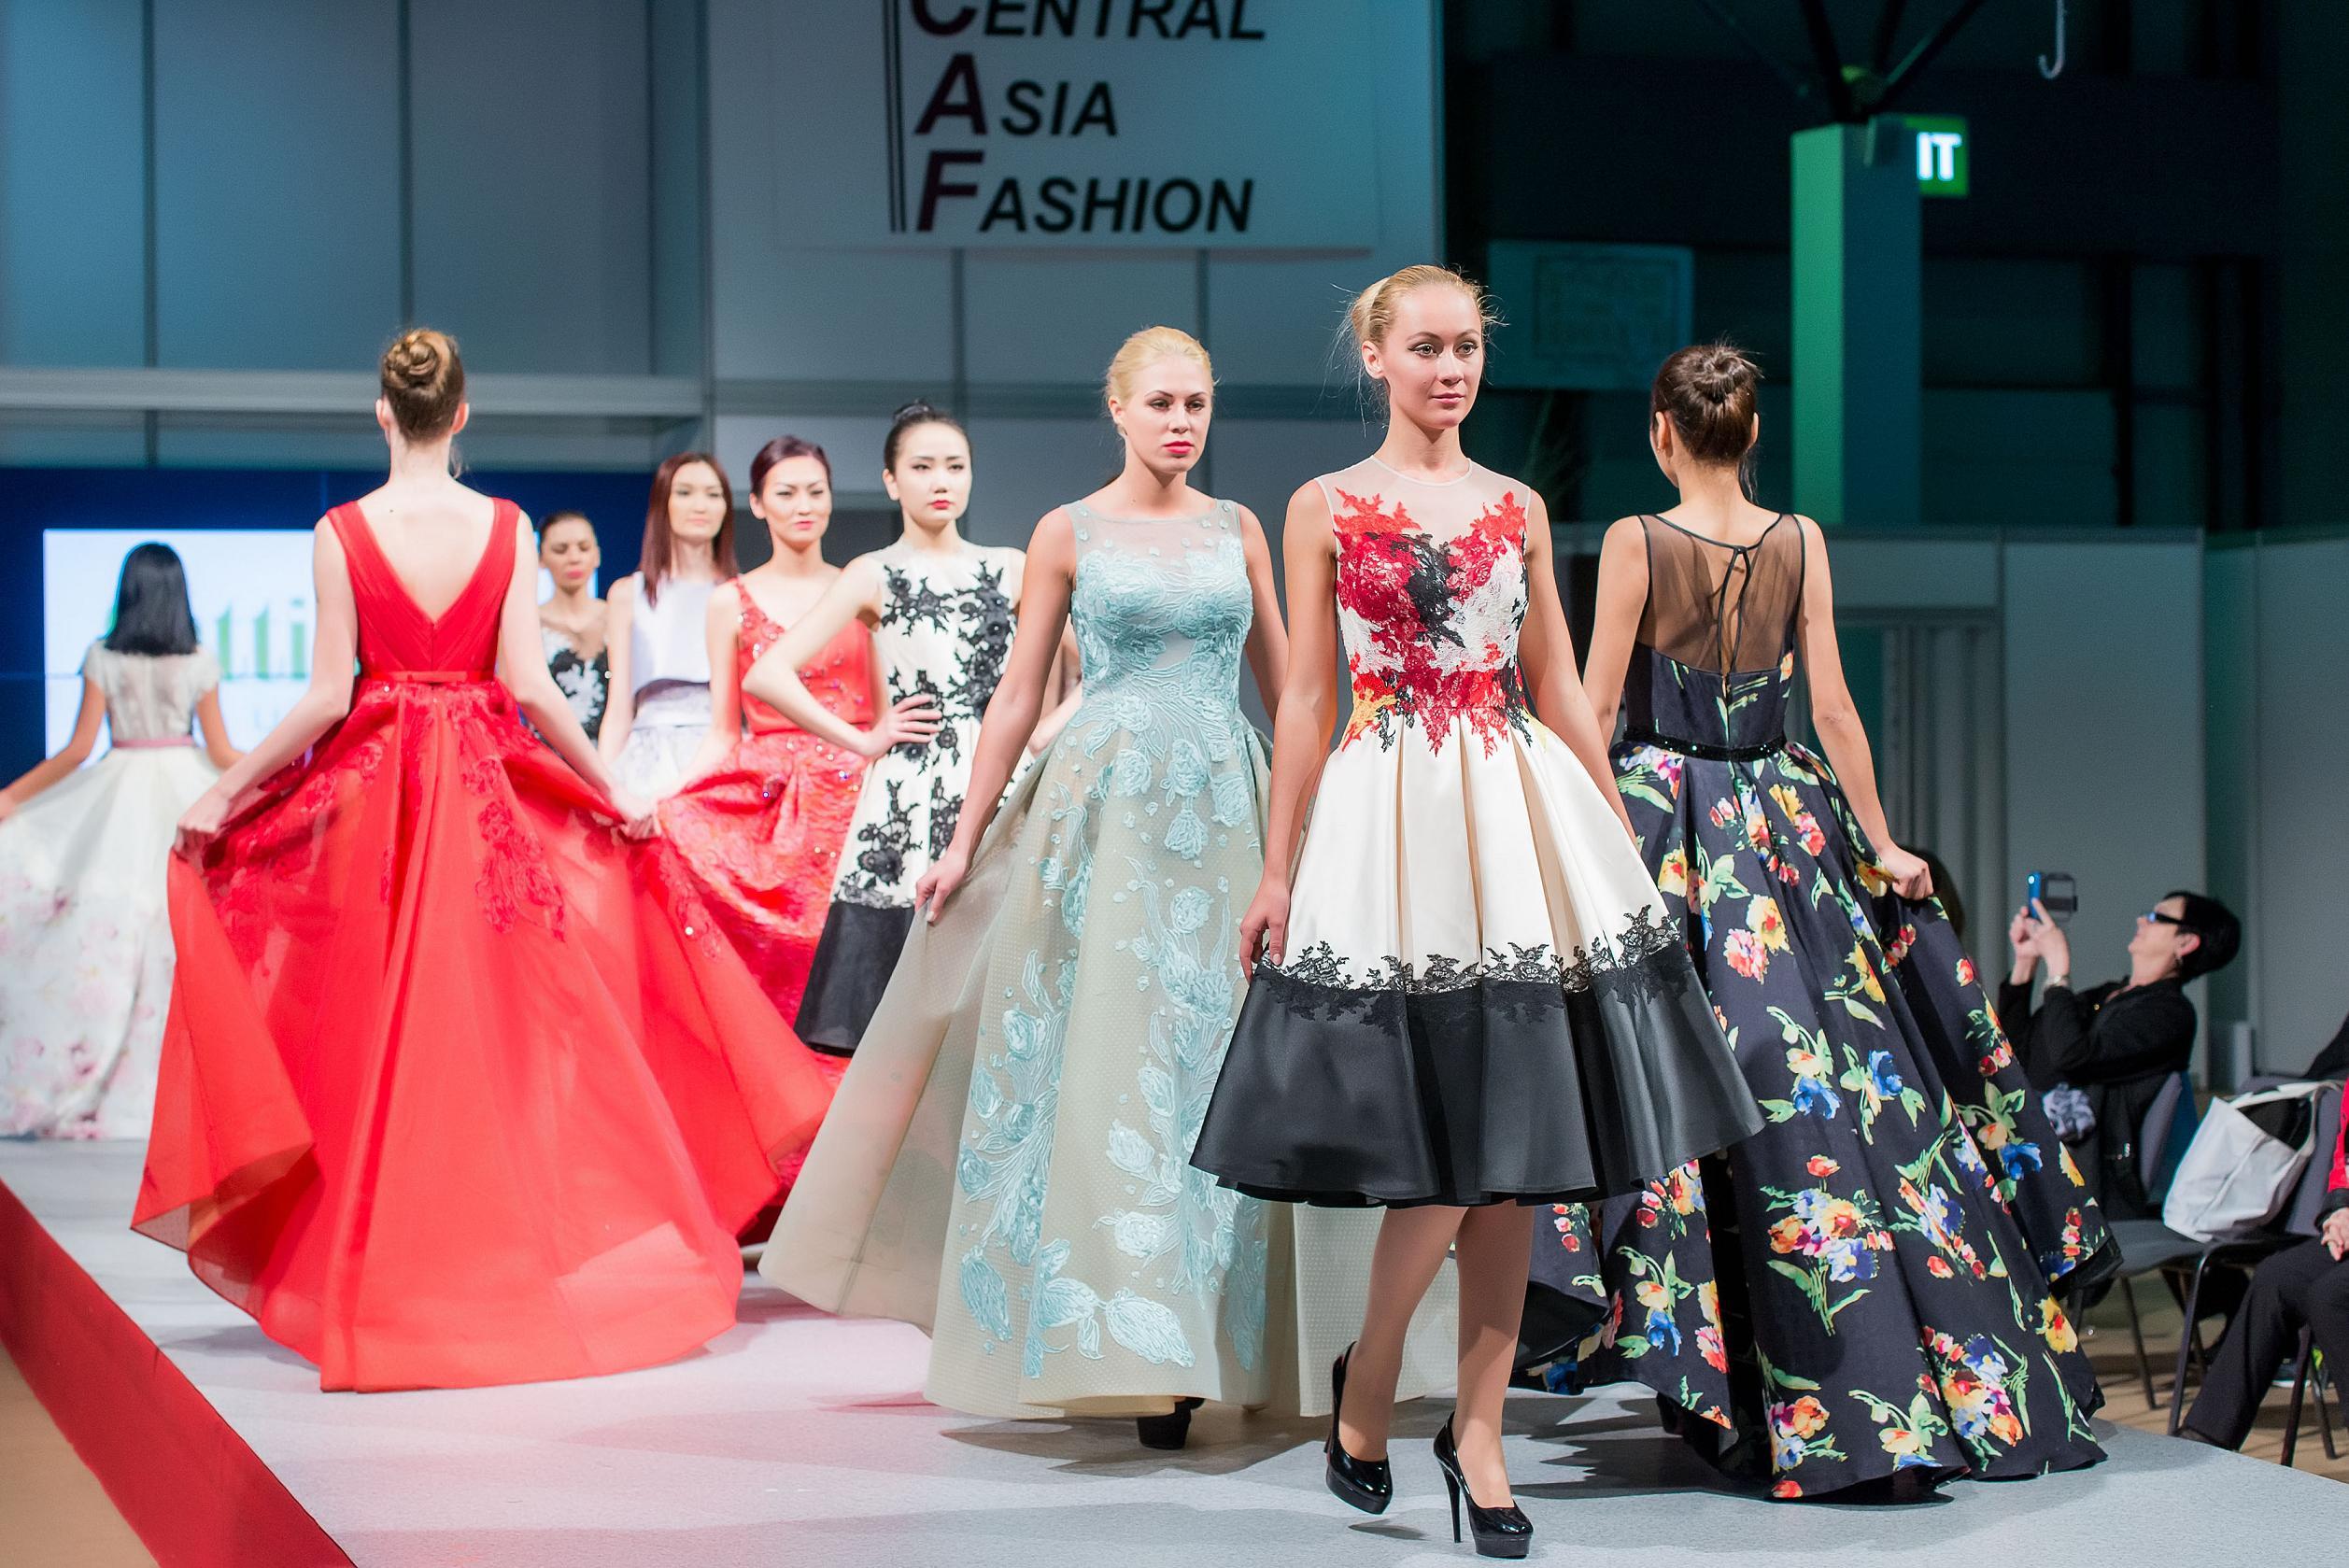 Выставка моды Central Asia Fashion Spring-2016   Давай Сходим! Алматы add9475e18f